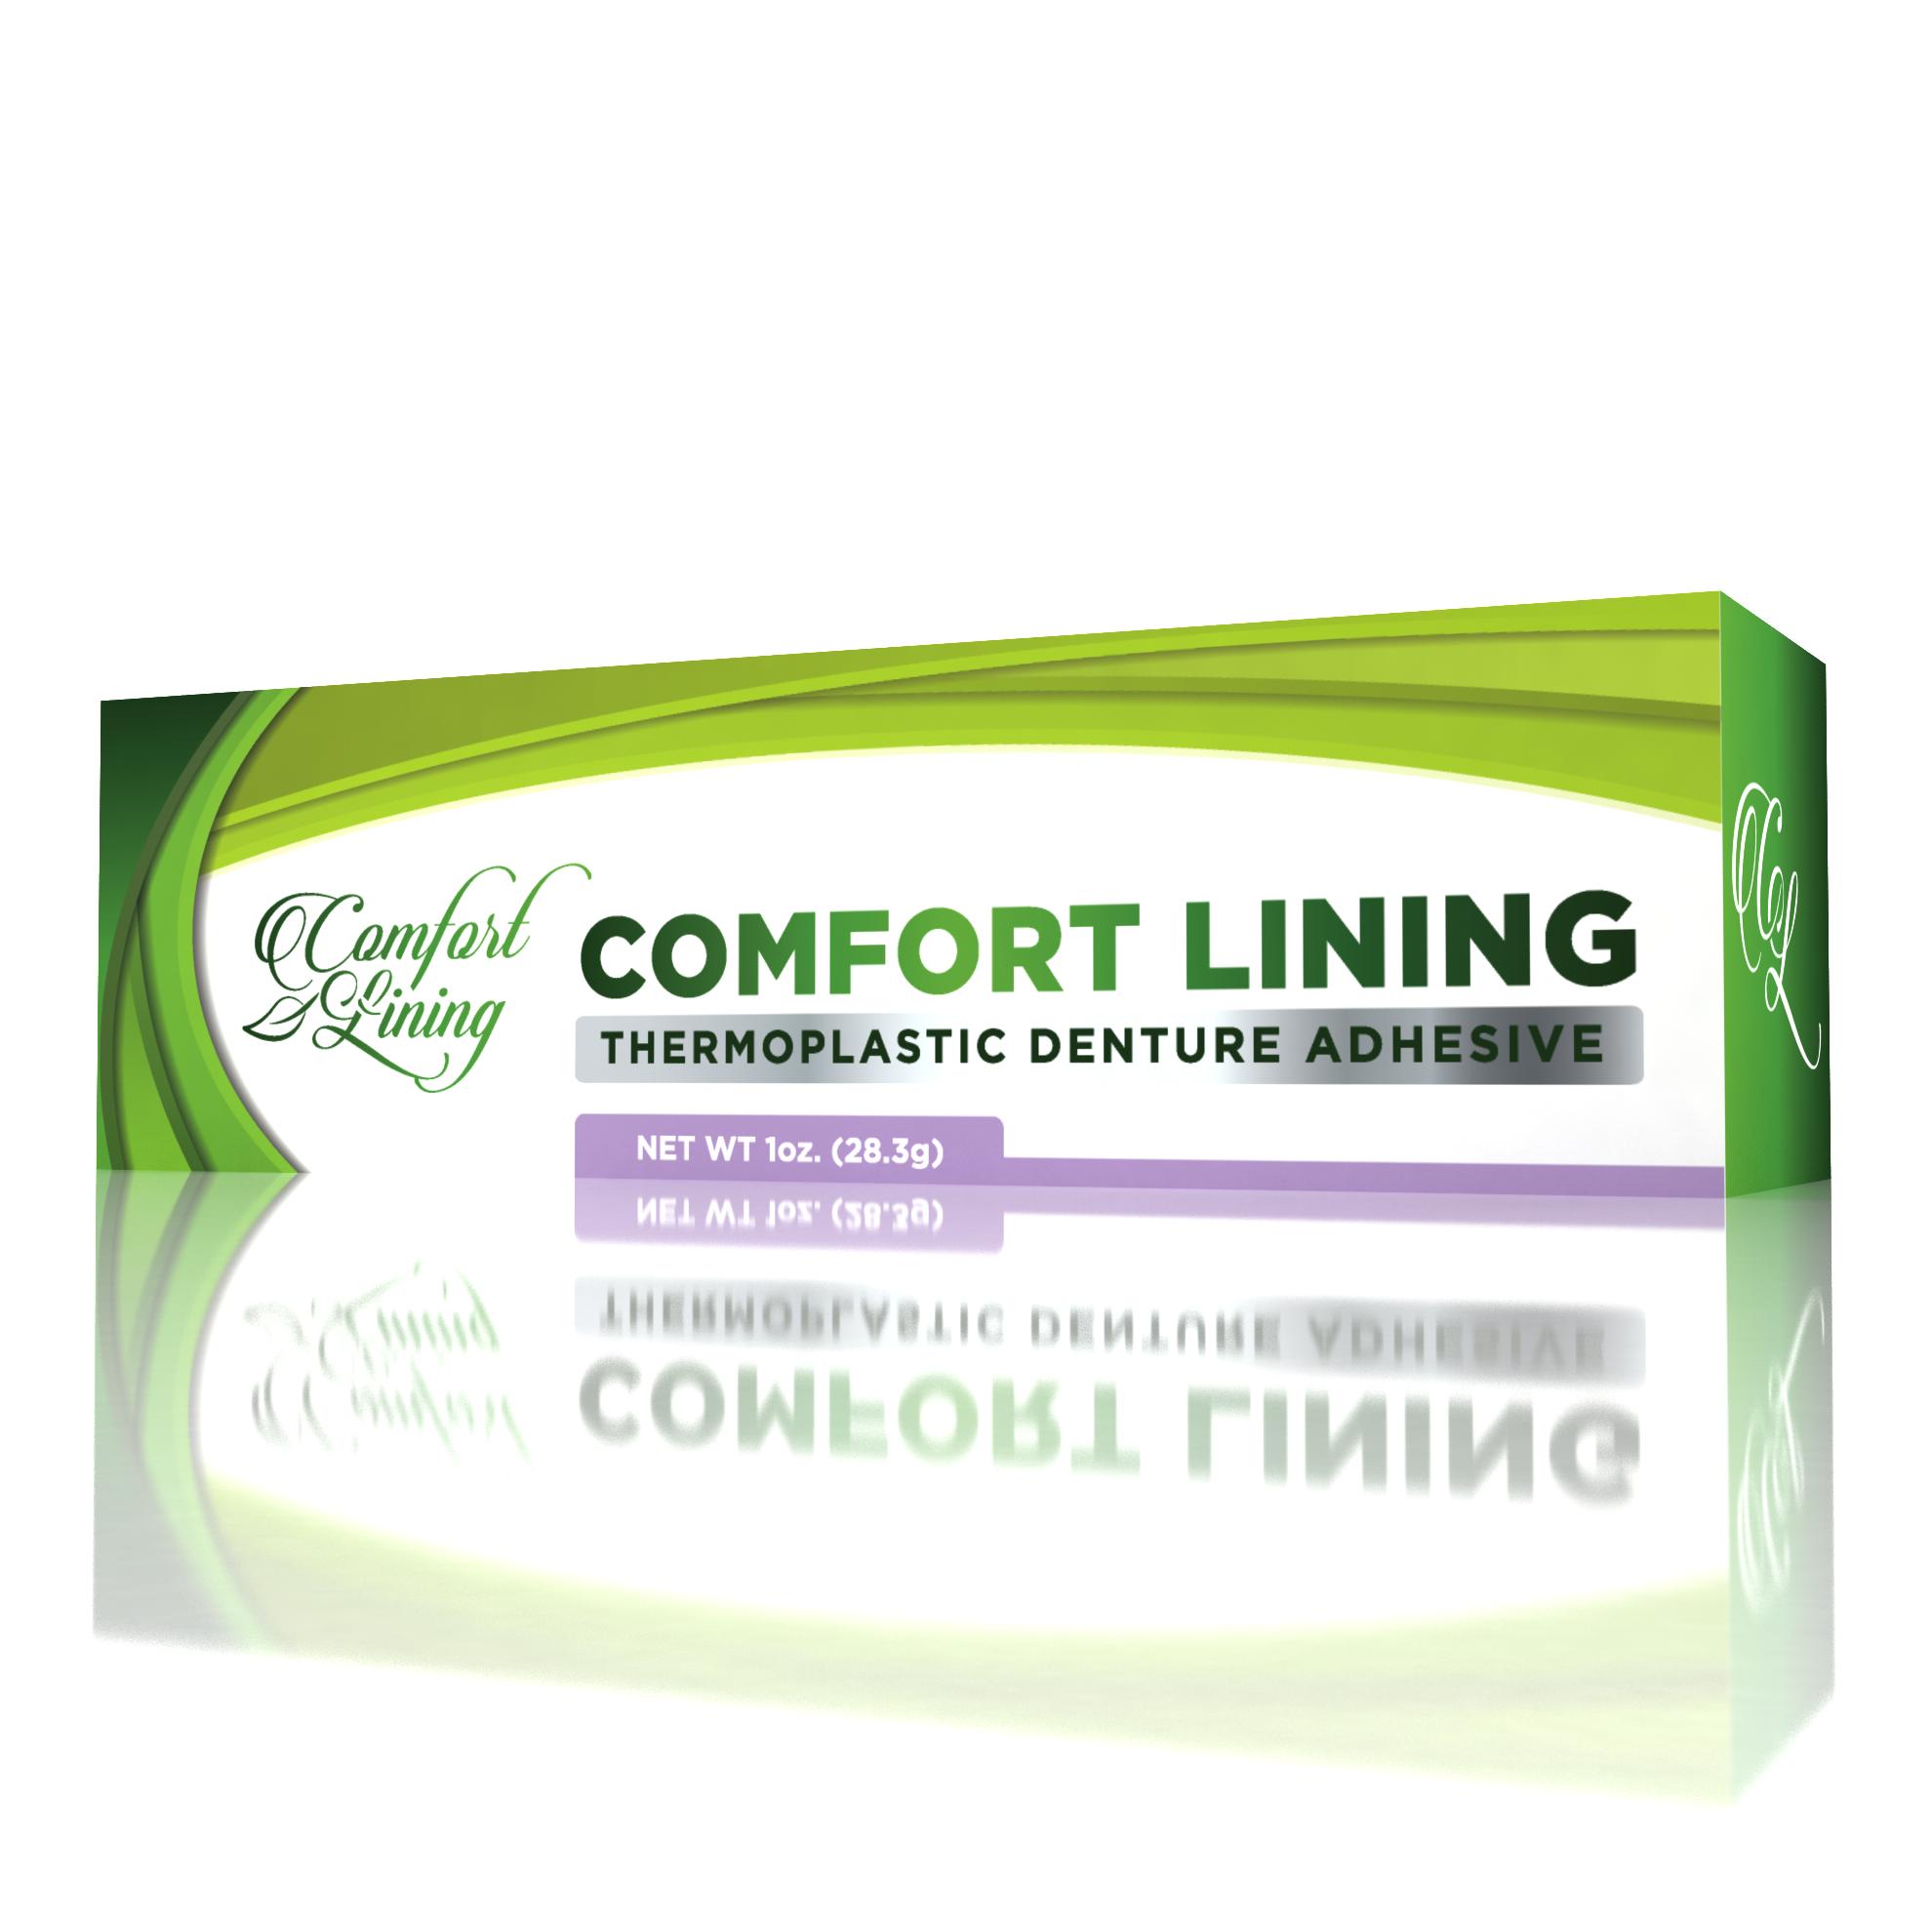 Comfort Lining Thermoplastic Denture Adhesive